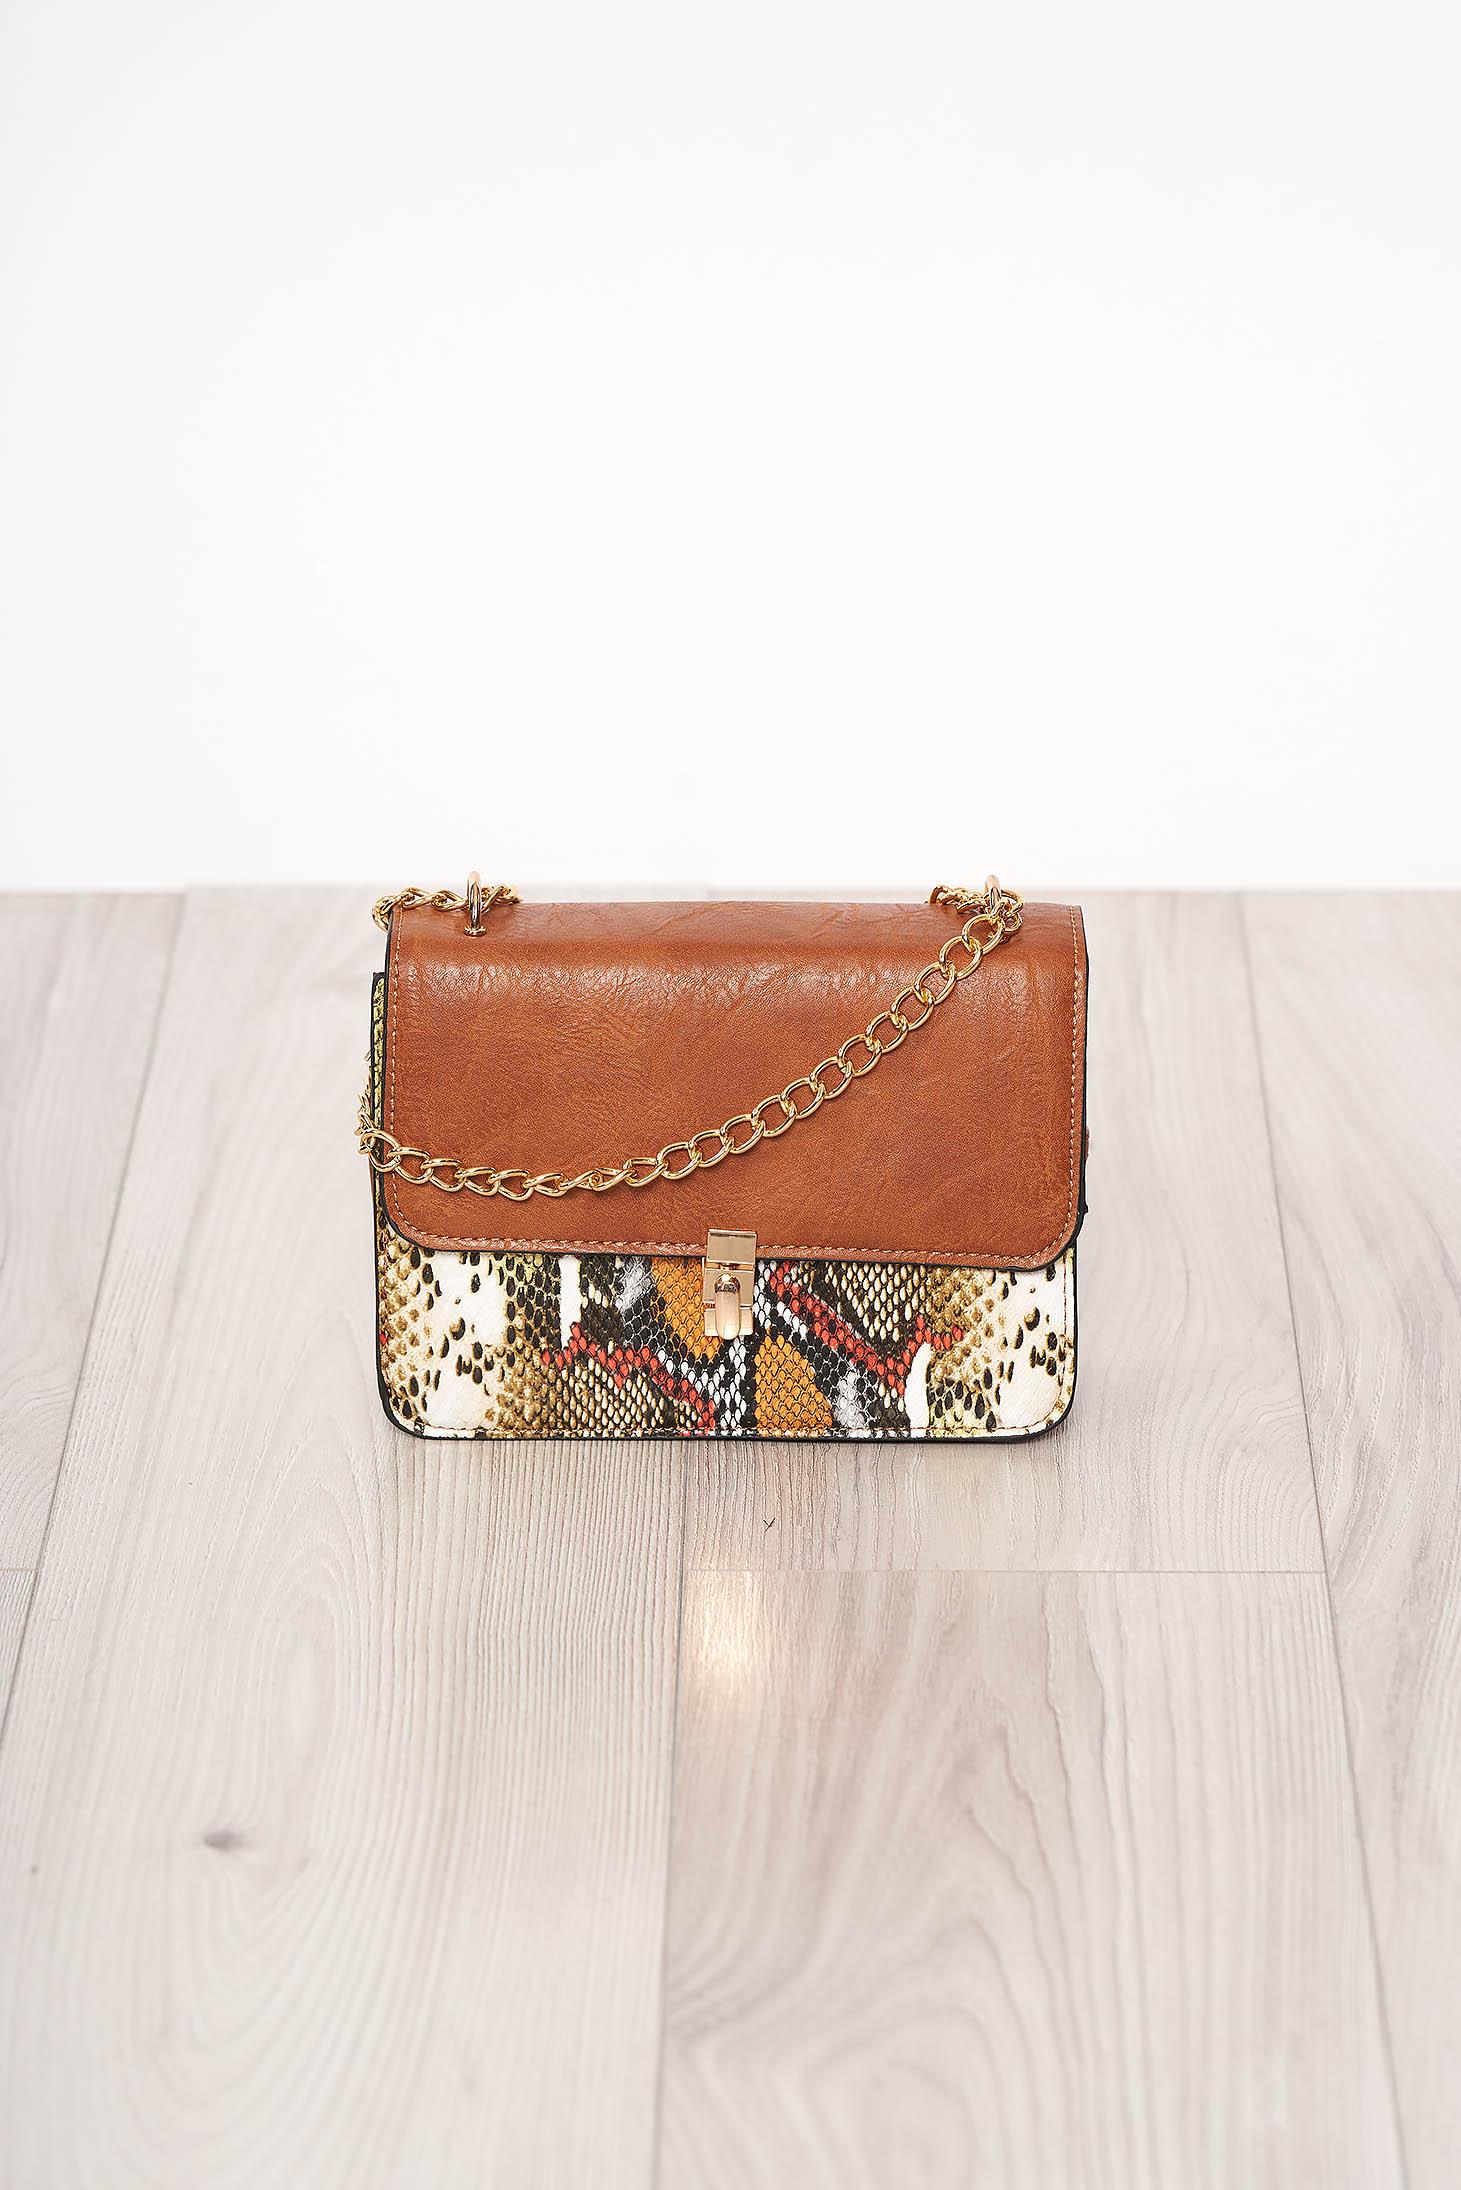 Geanta dama SunShine khaki din piele ecologica cu animal print cu maner lung tip lantisor si accesorizata cu o catarama